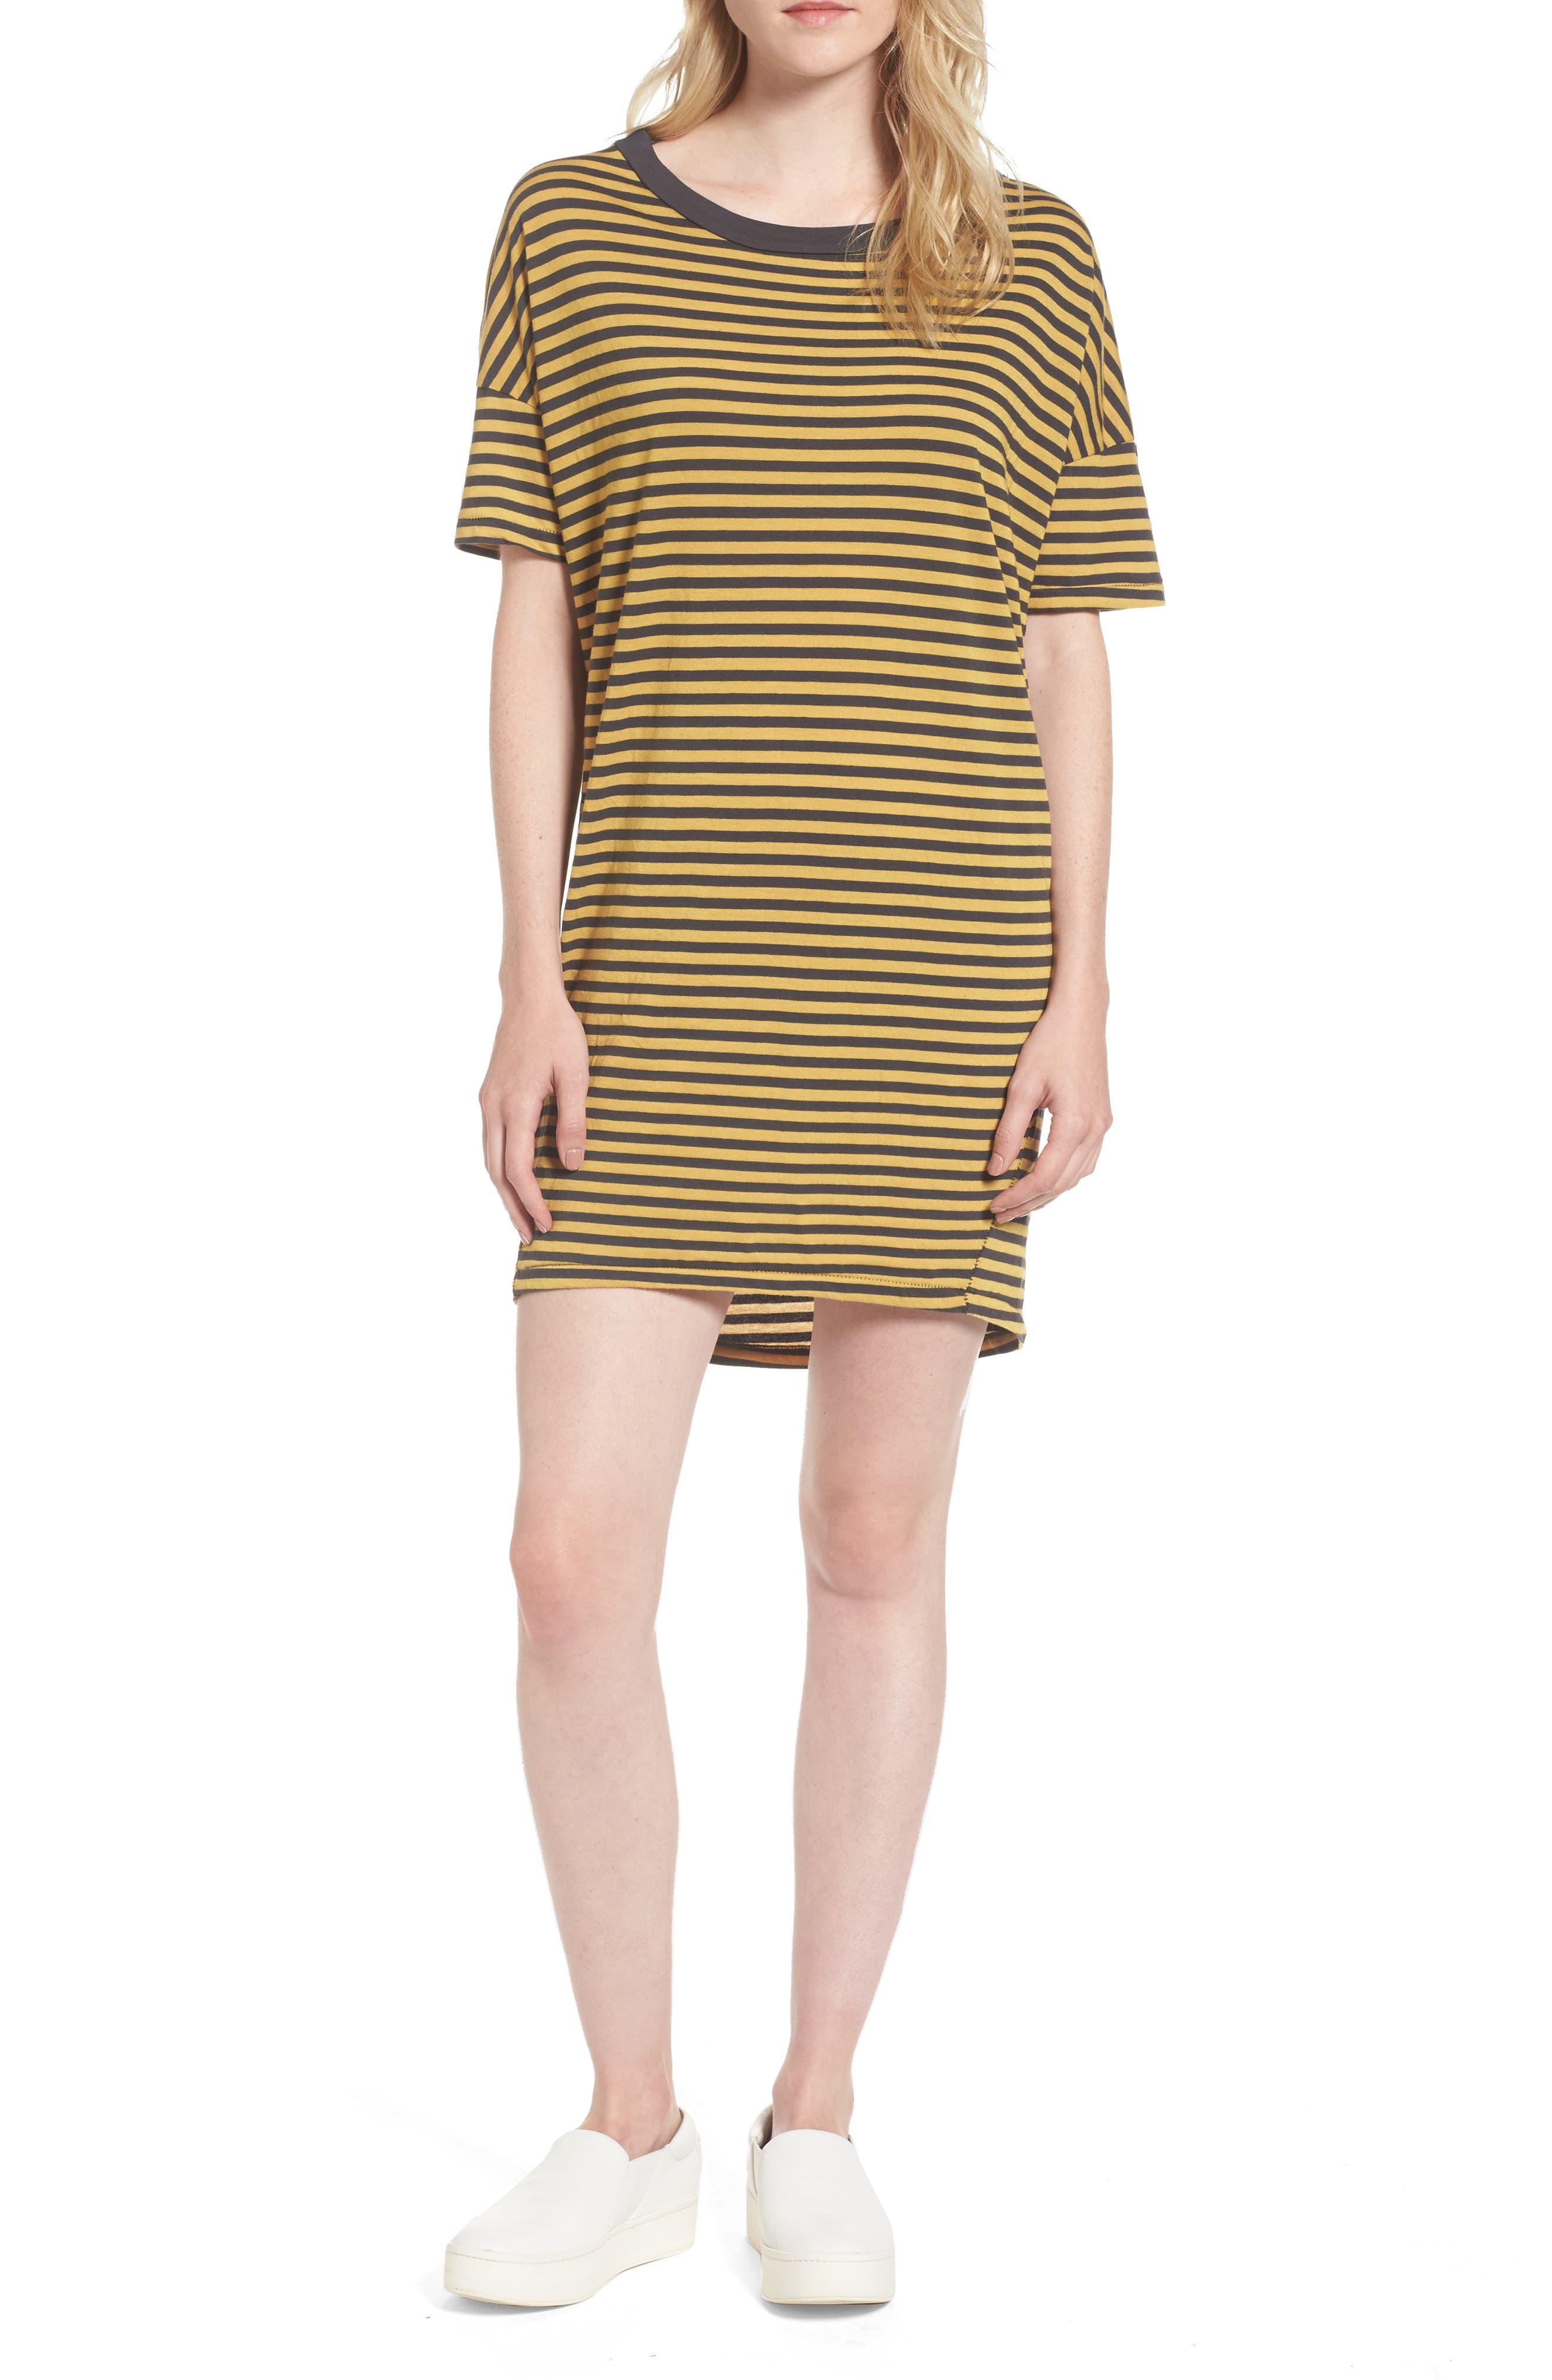 Stateside Mustard Stripe T-Shirt Dress